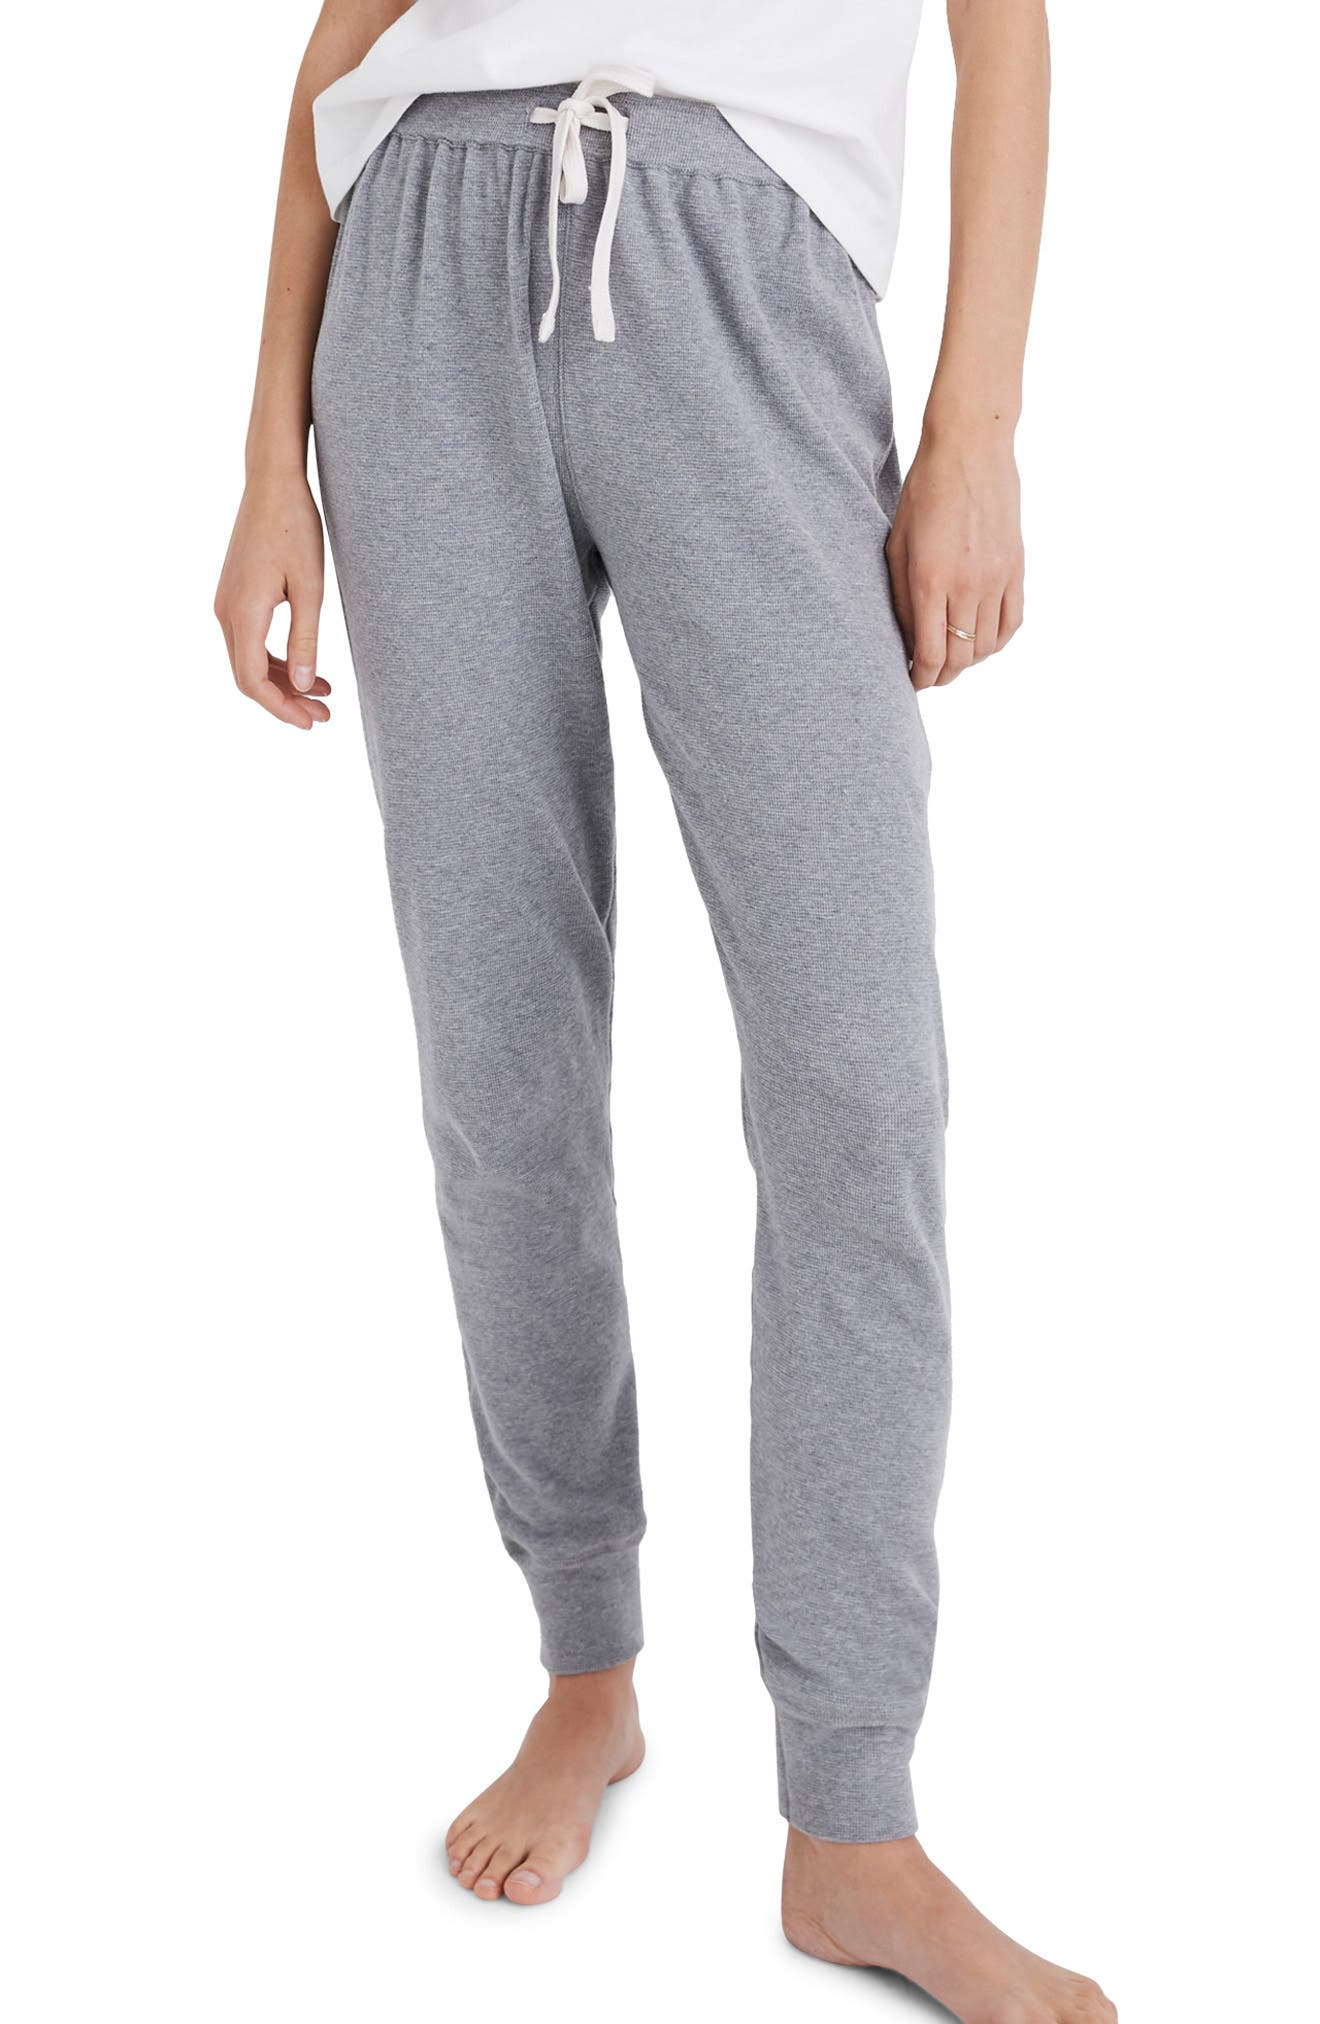 Honeycomb Pajama Sweatpants,                             Main thumbnail 1, color,                             HEATHER PEPPER